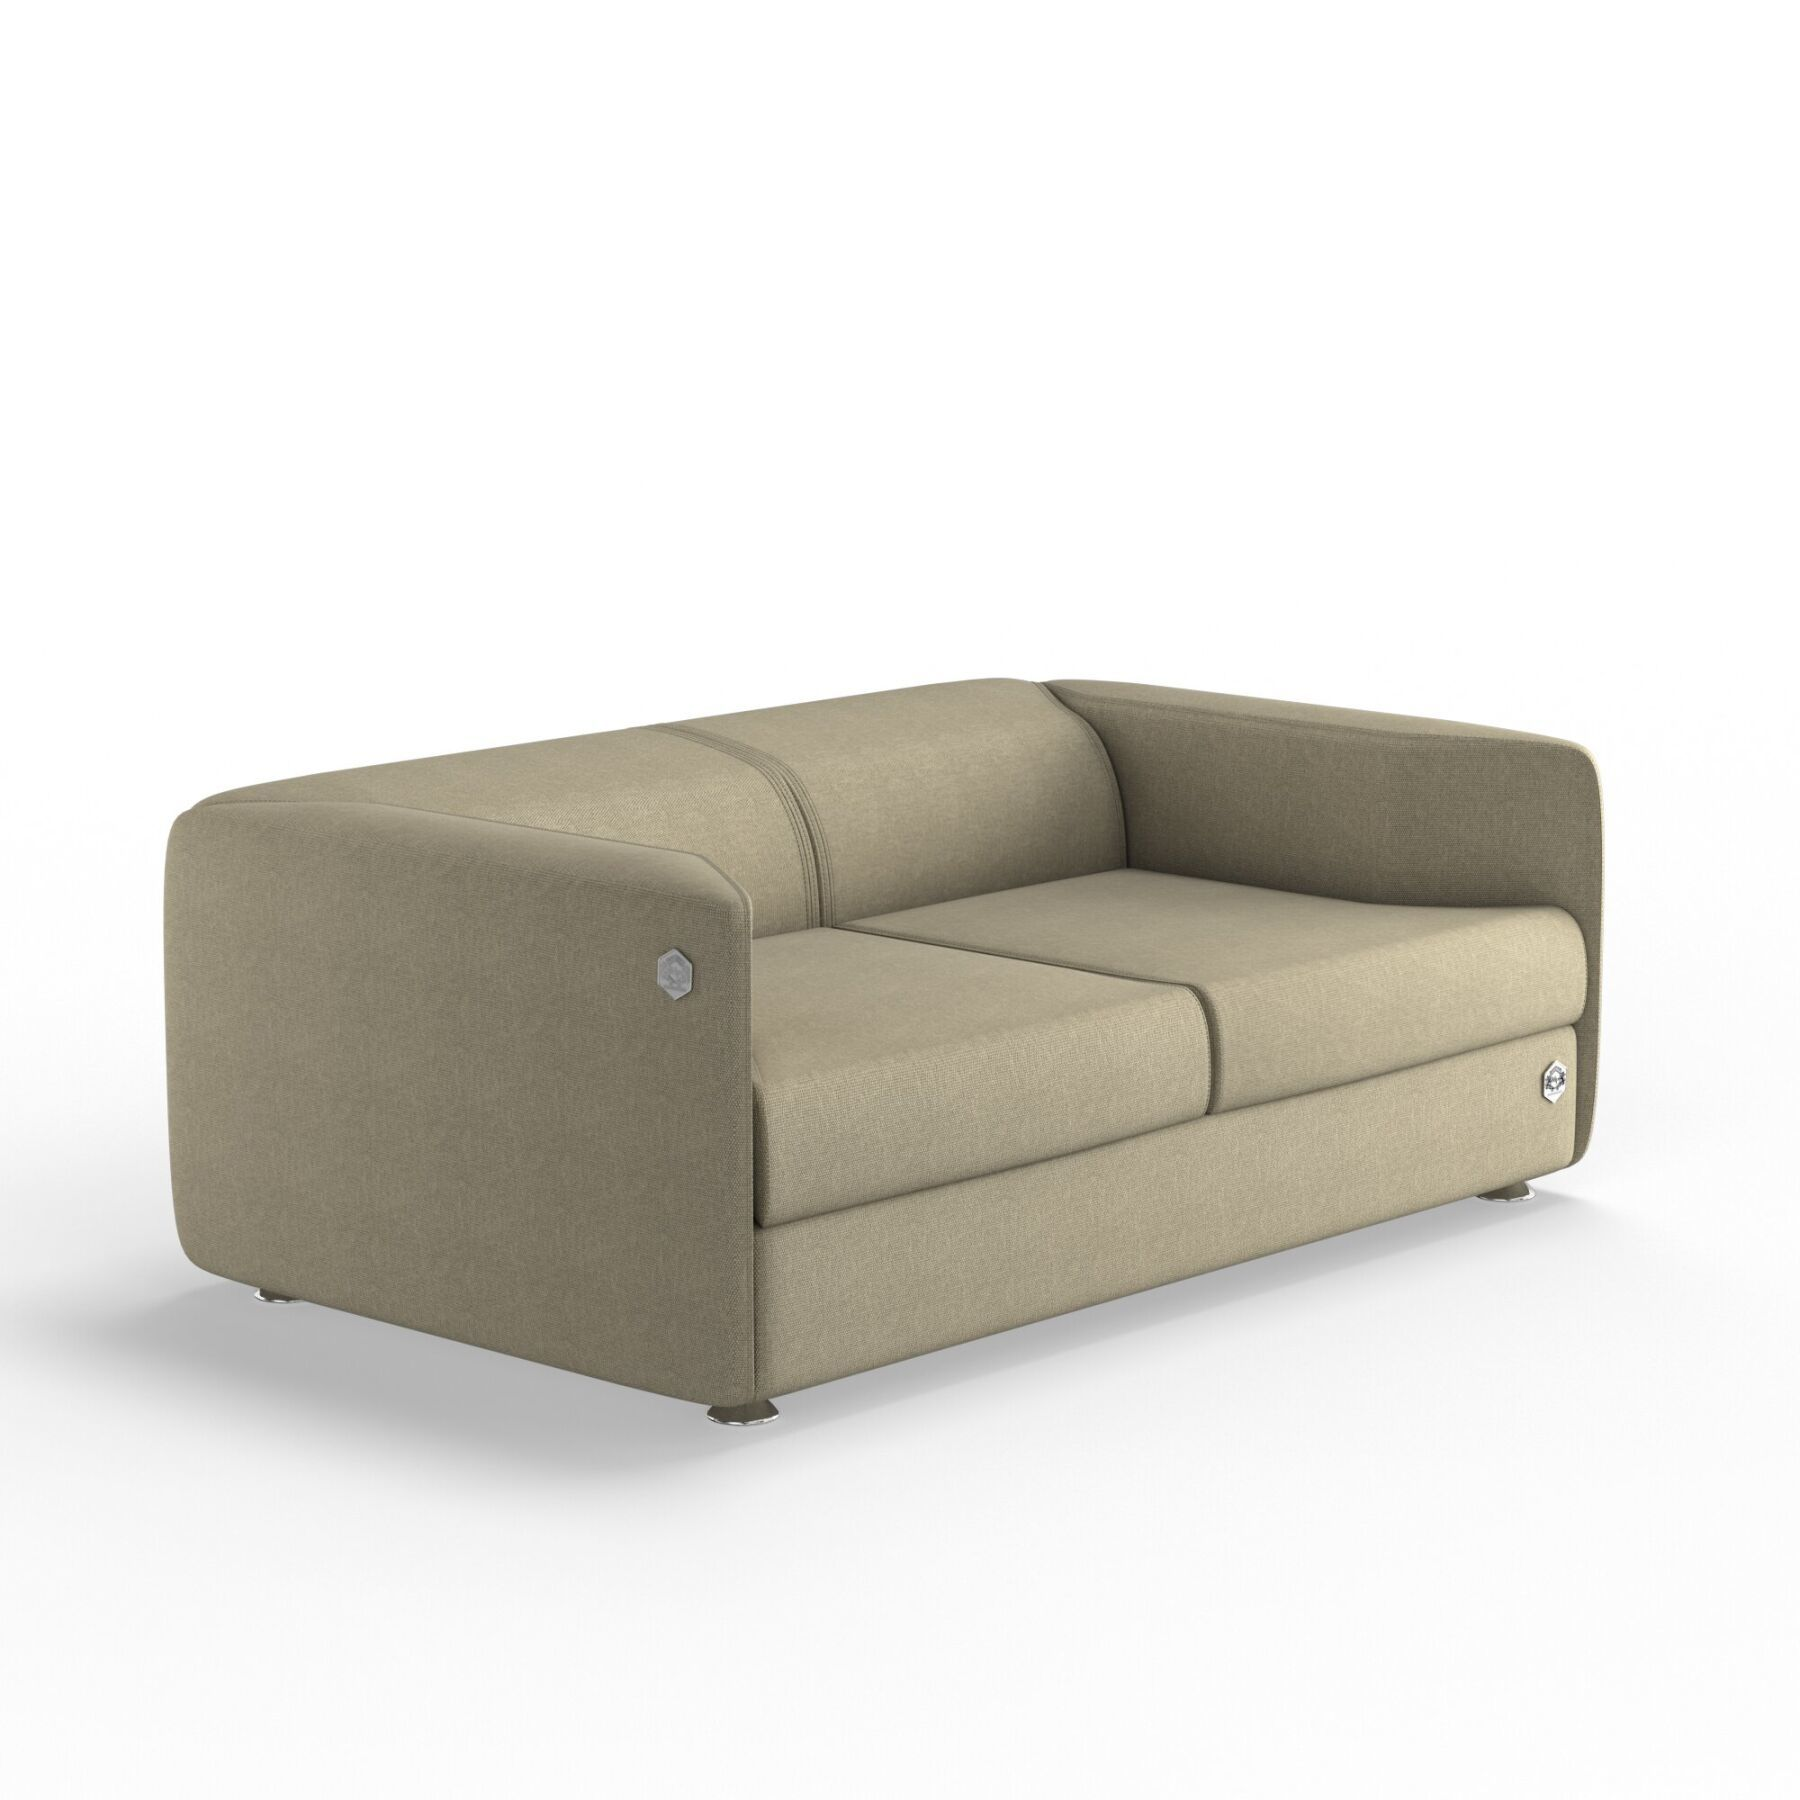 Мягкое кресло KULIK SYSTEM POLIEDRO Ткань 2